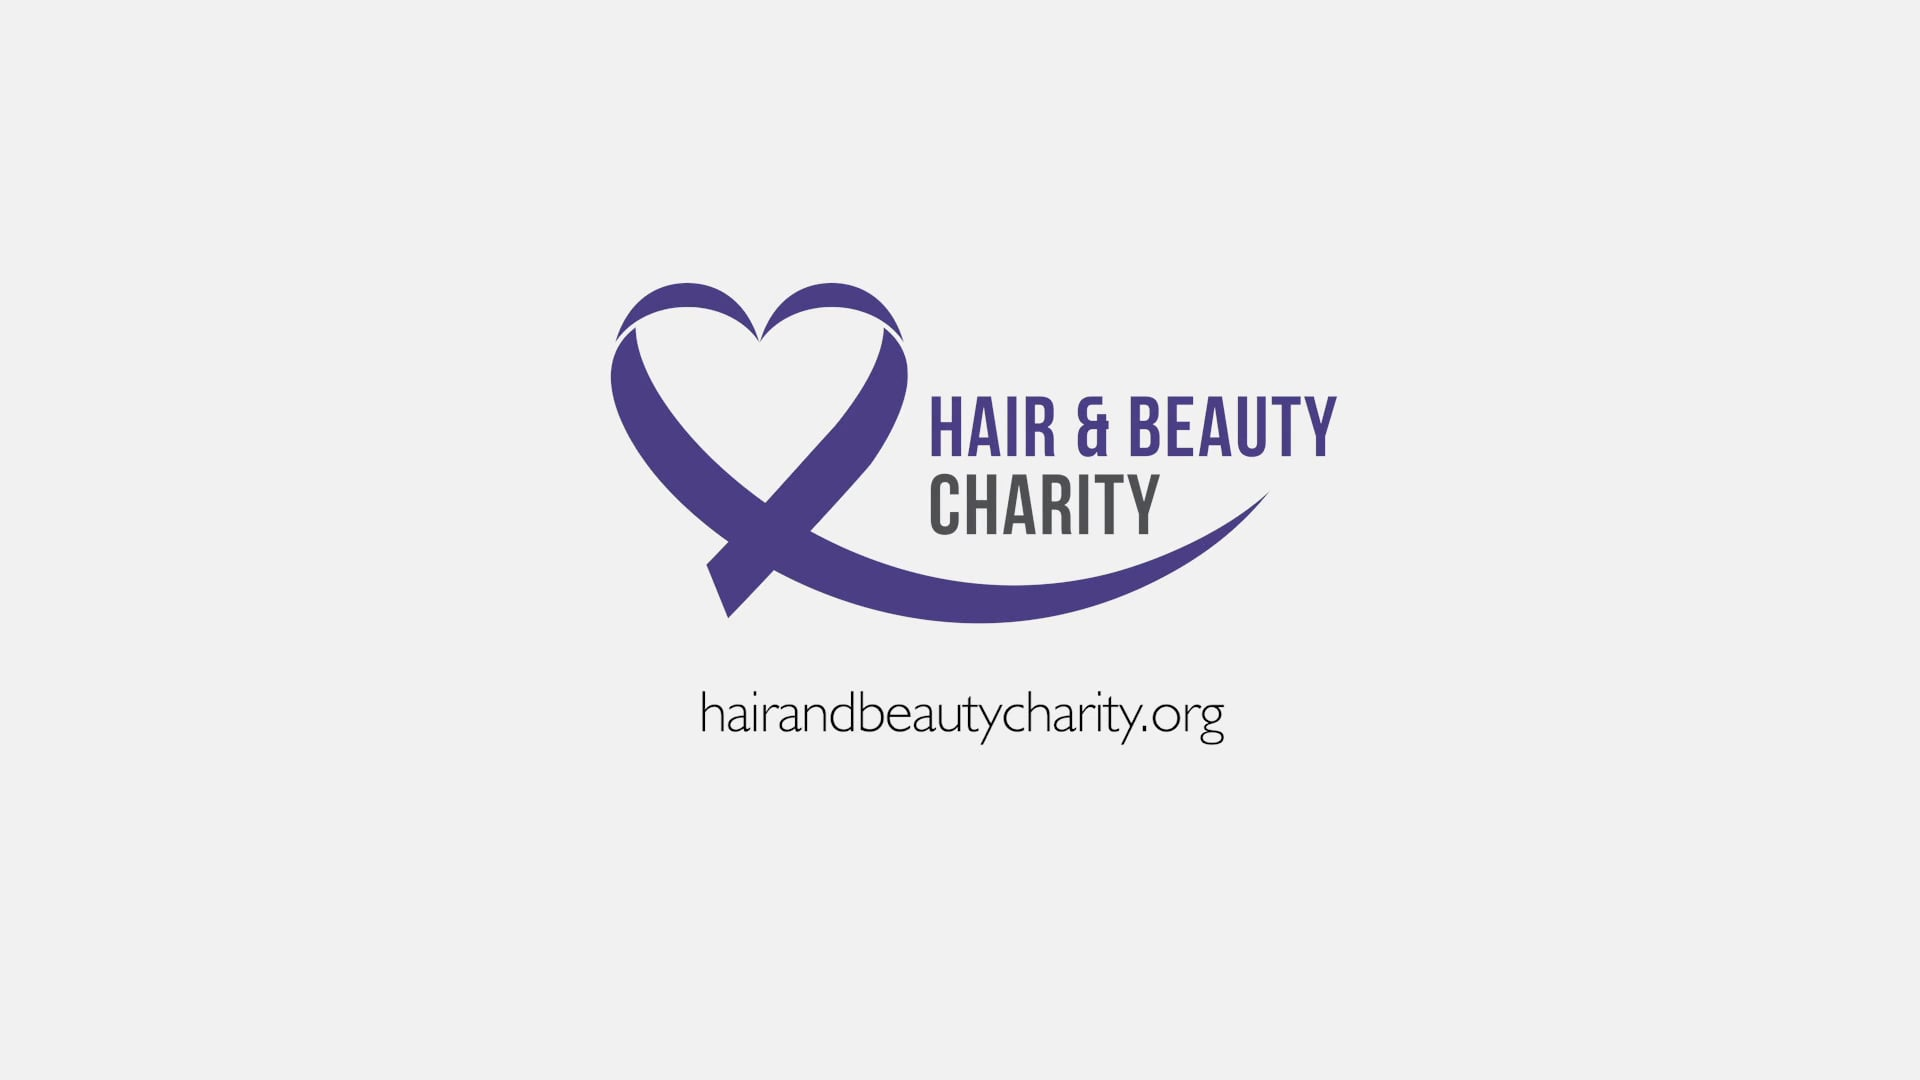 Hair & Beauty Charity